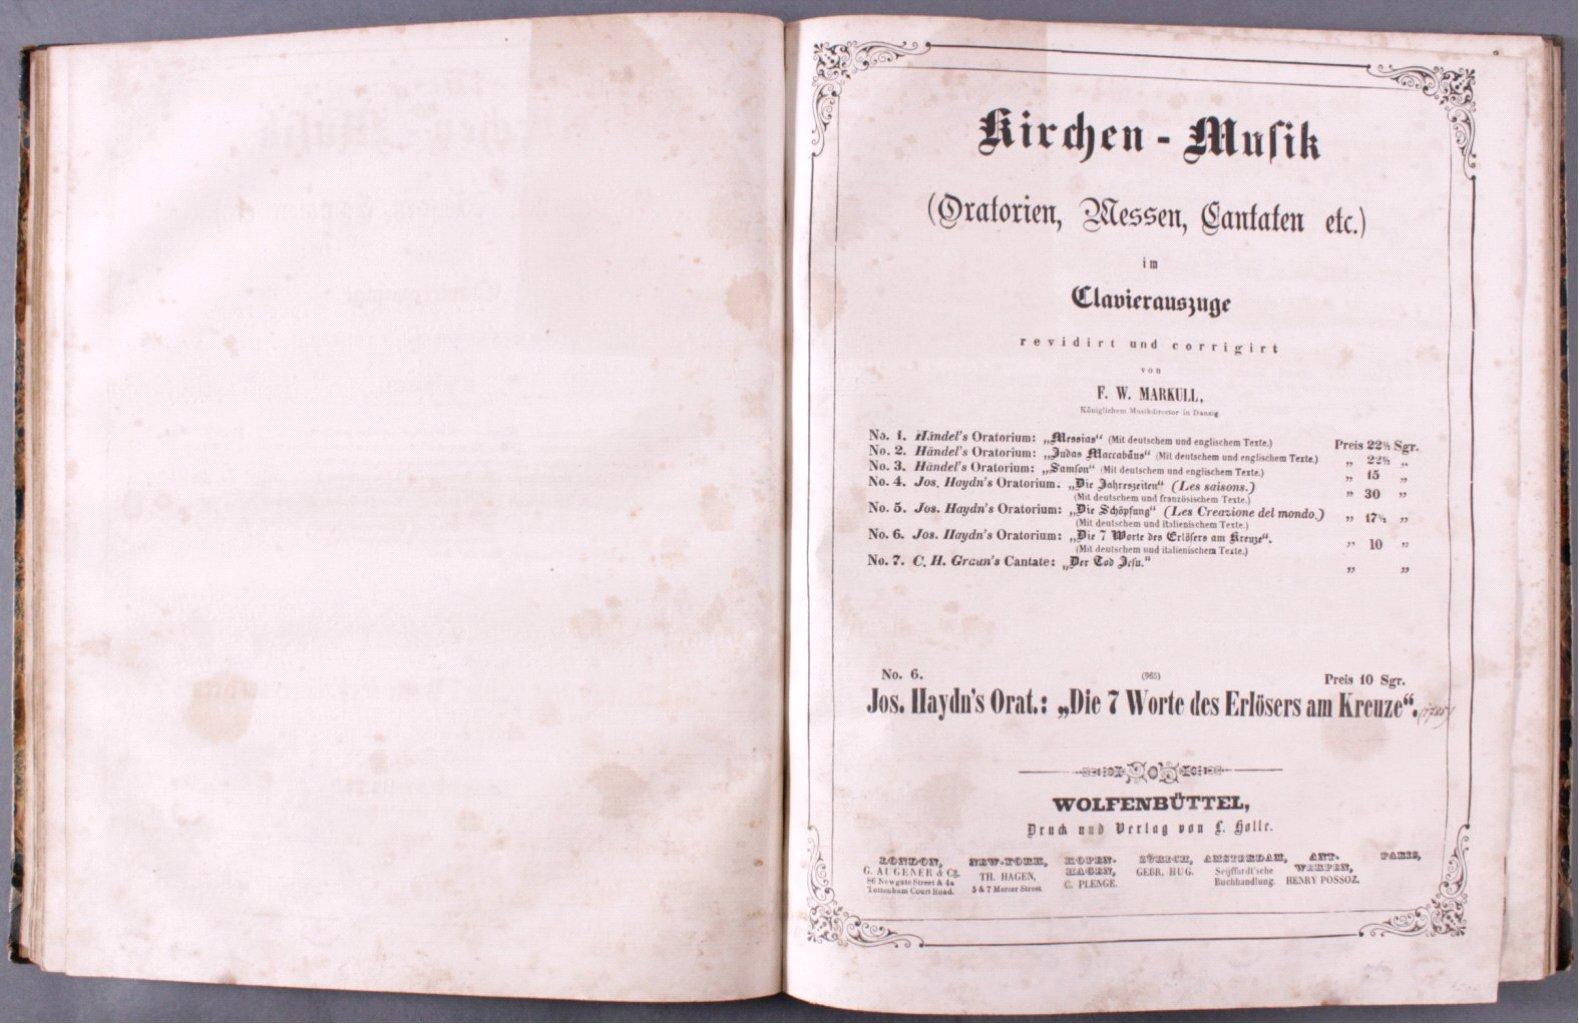 F.W. Markull. Kirchen-Musik-1